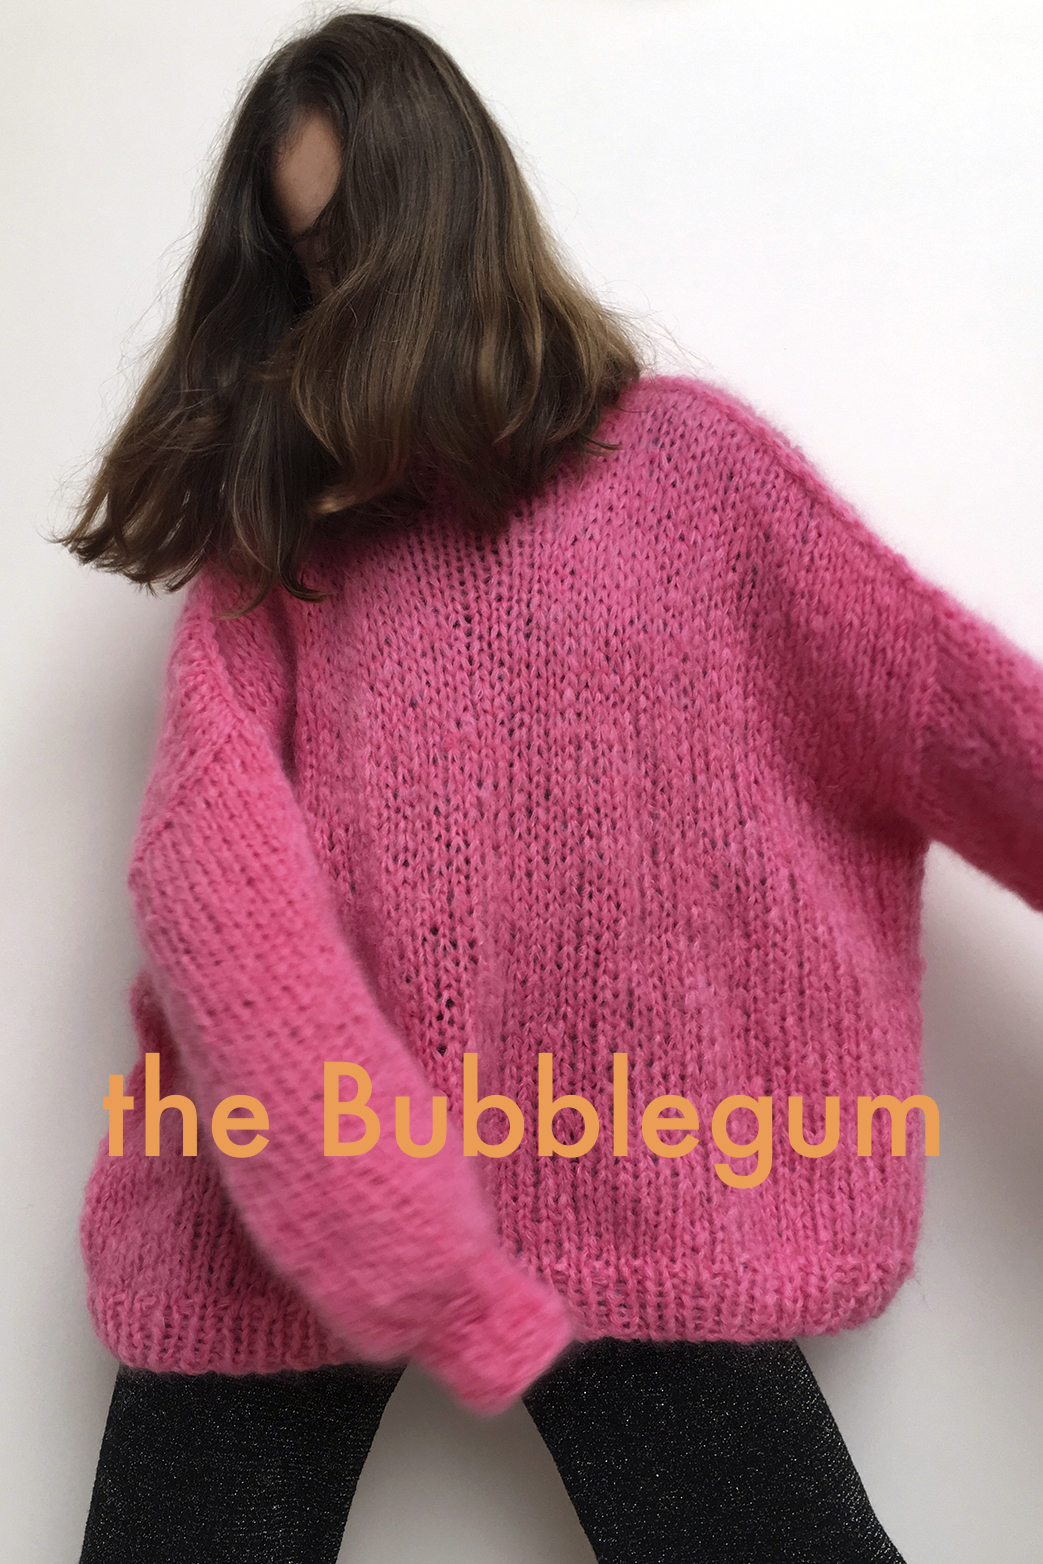 THE+BUBBLEGUM+COVER